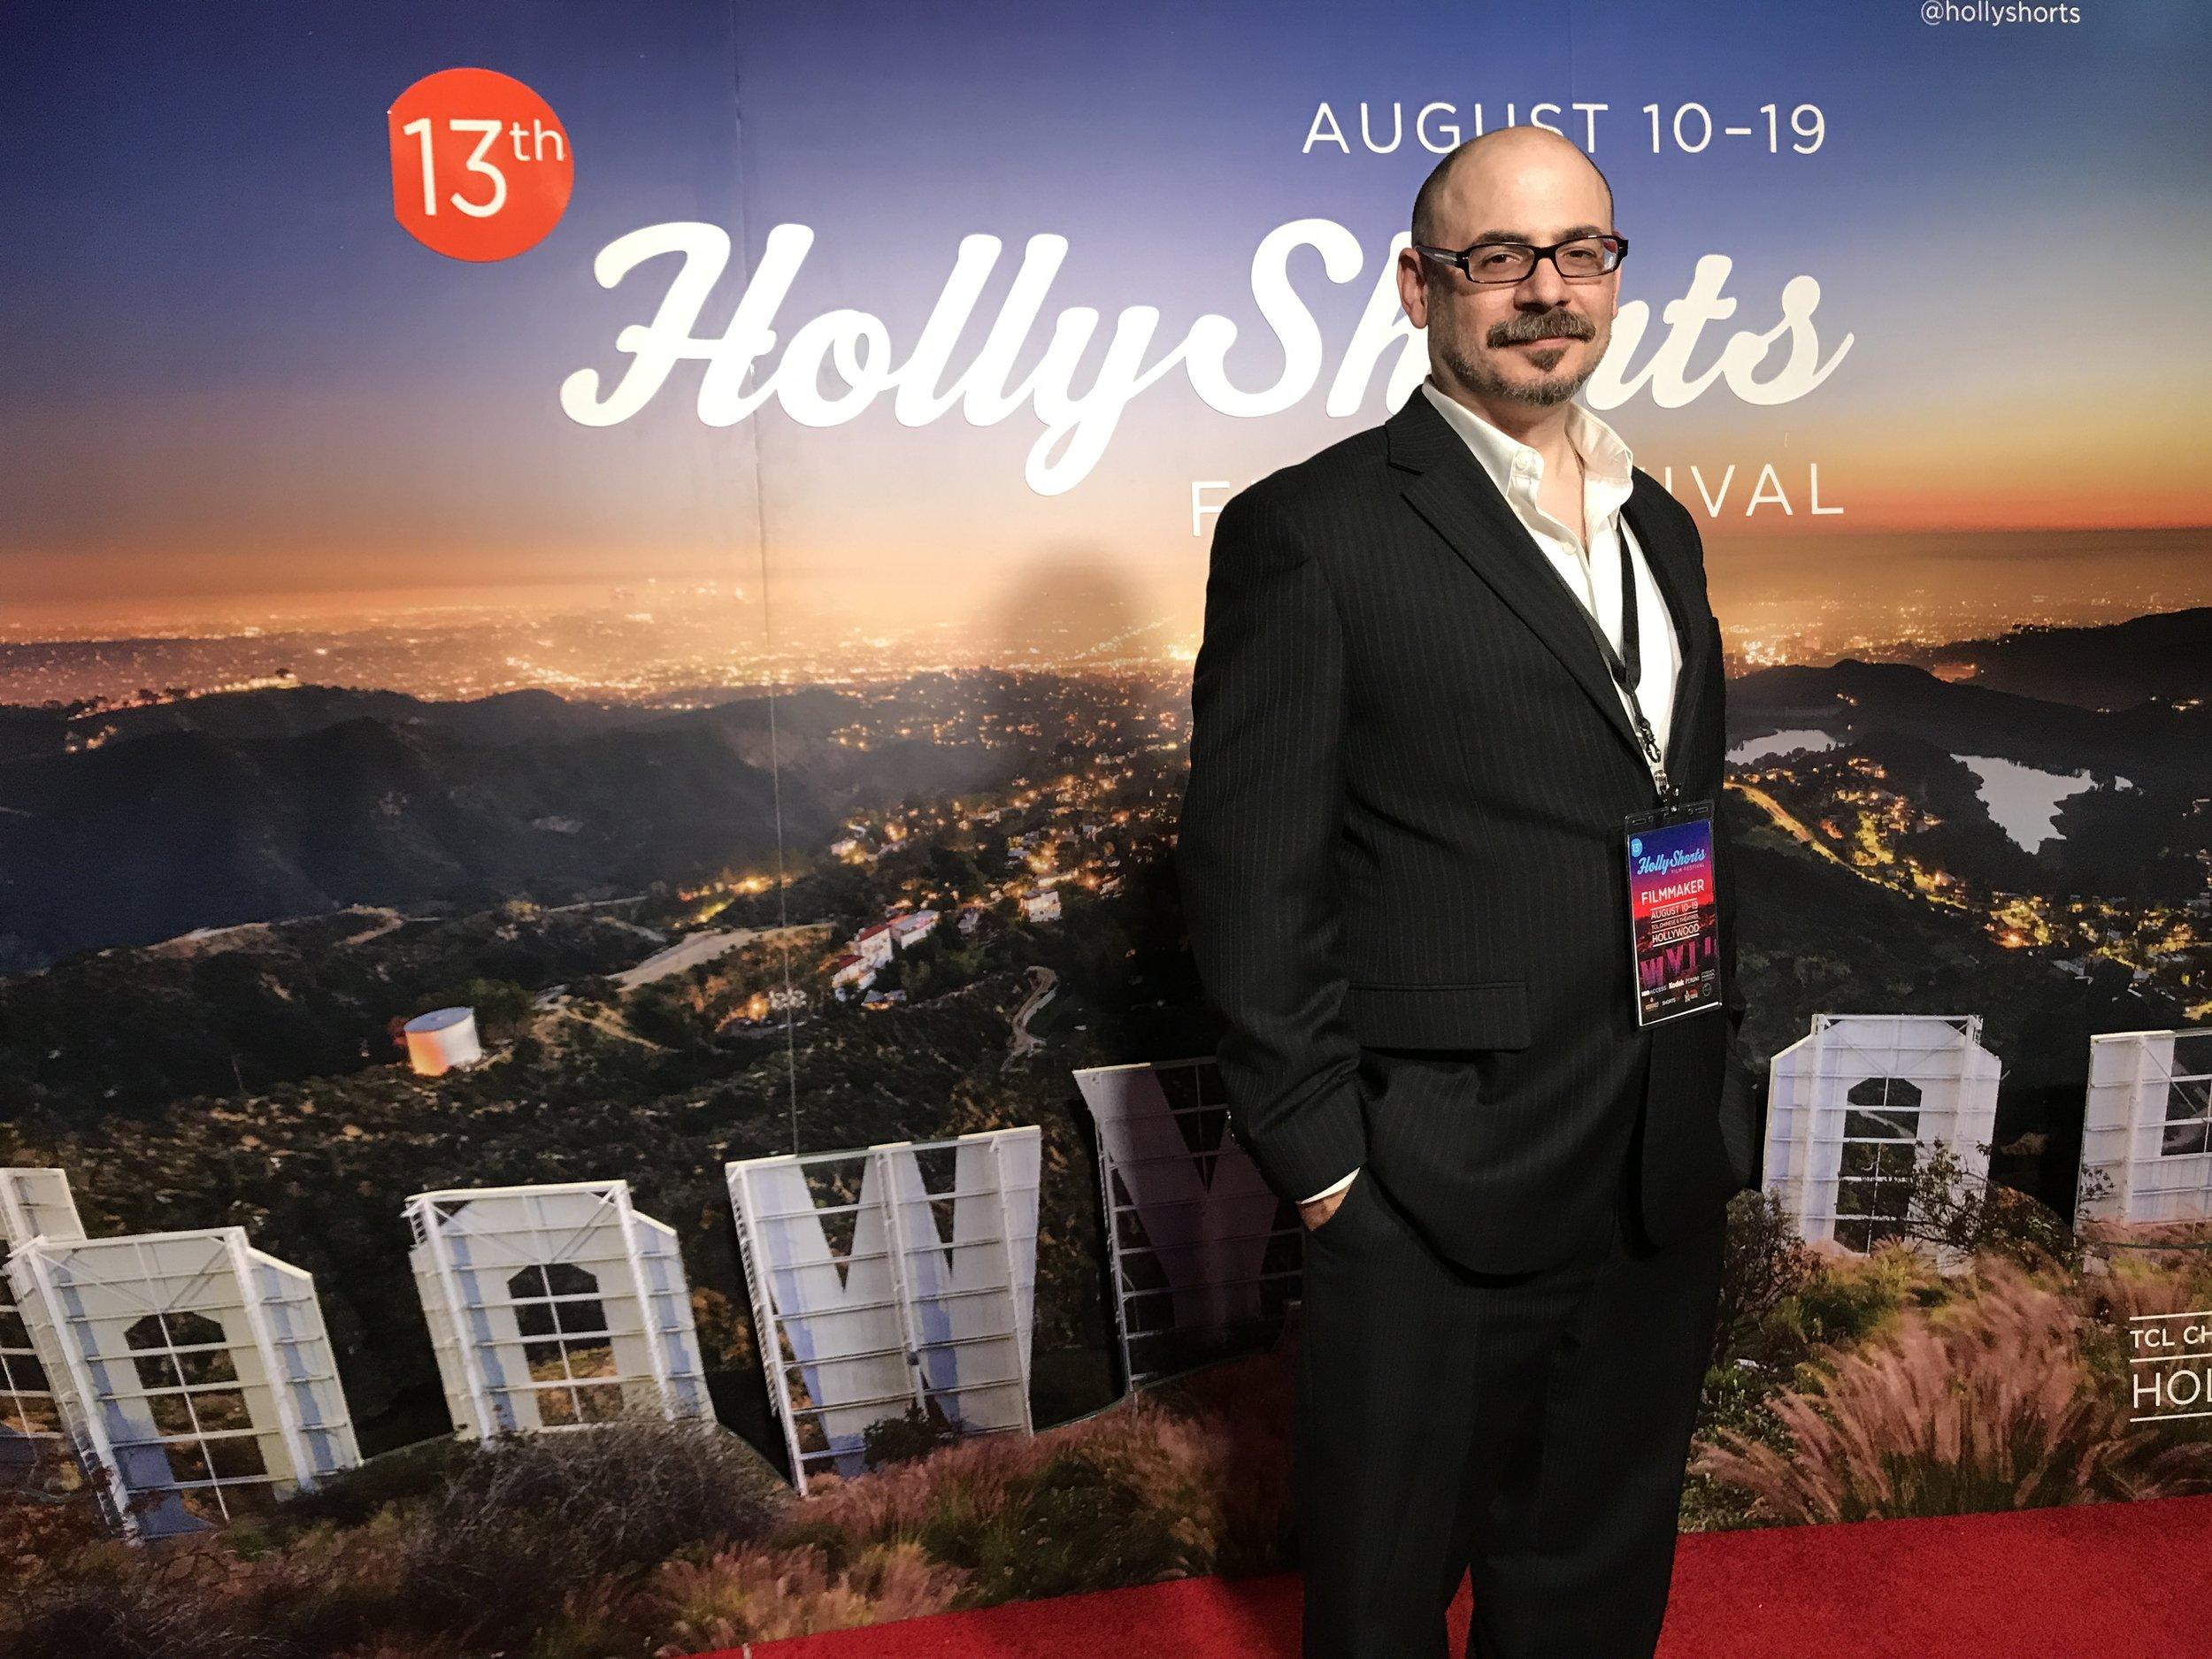 Jason Ragosta attending the HollyShorts Film Festival at Los Angeles in 2017 |  Courtesy of Michael Paul